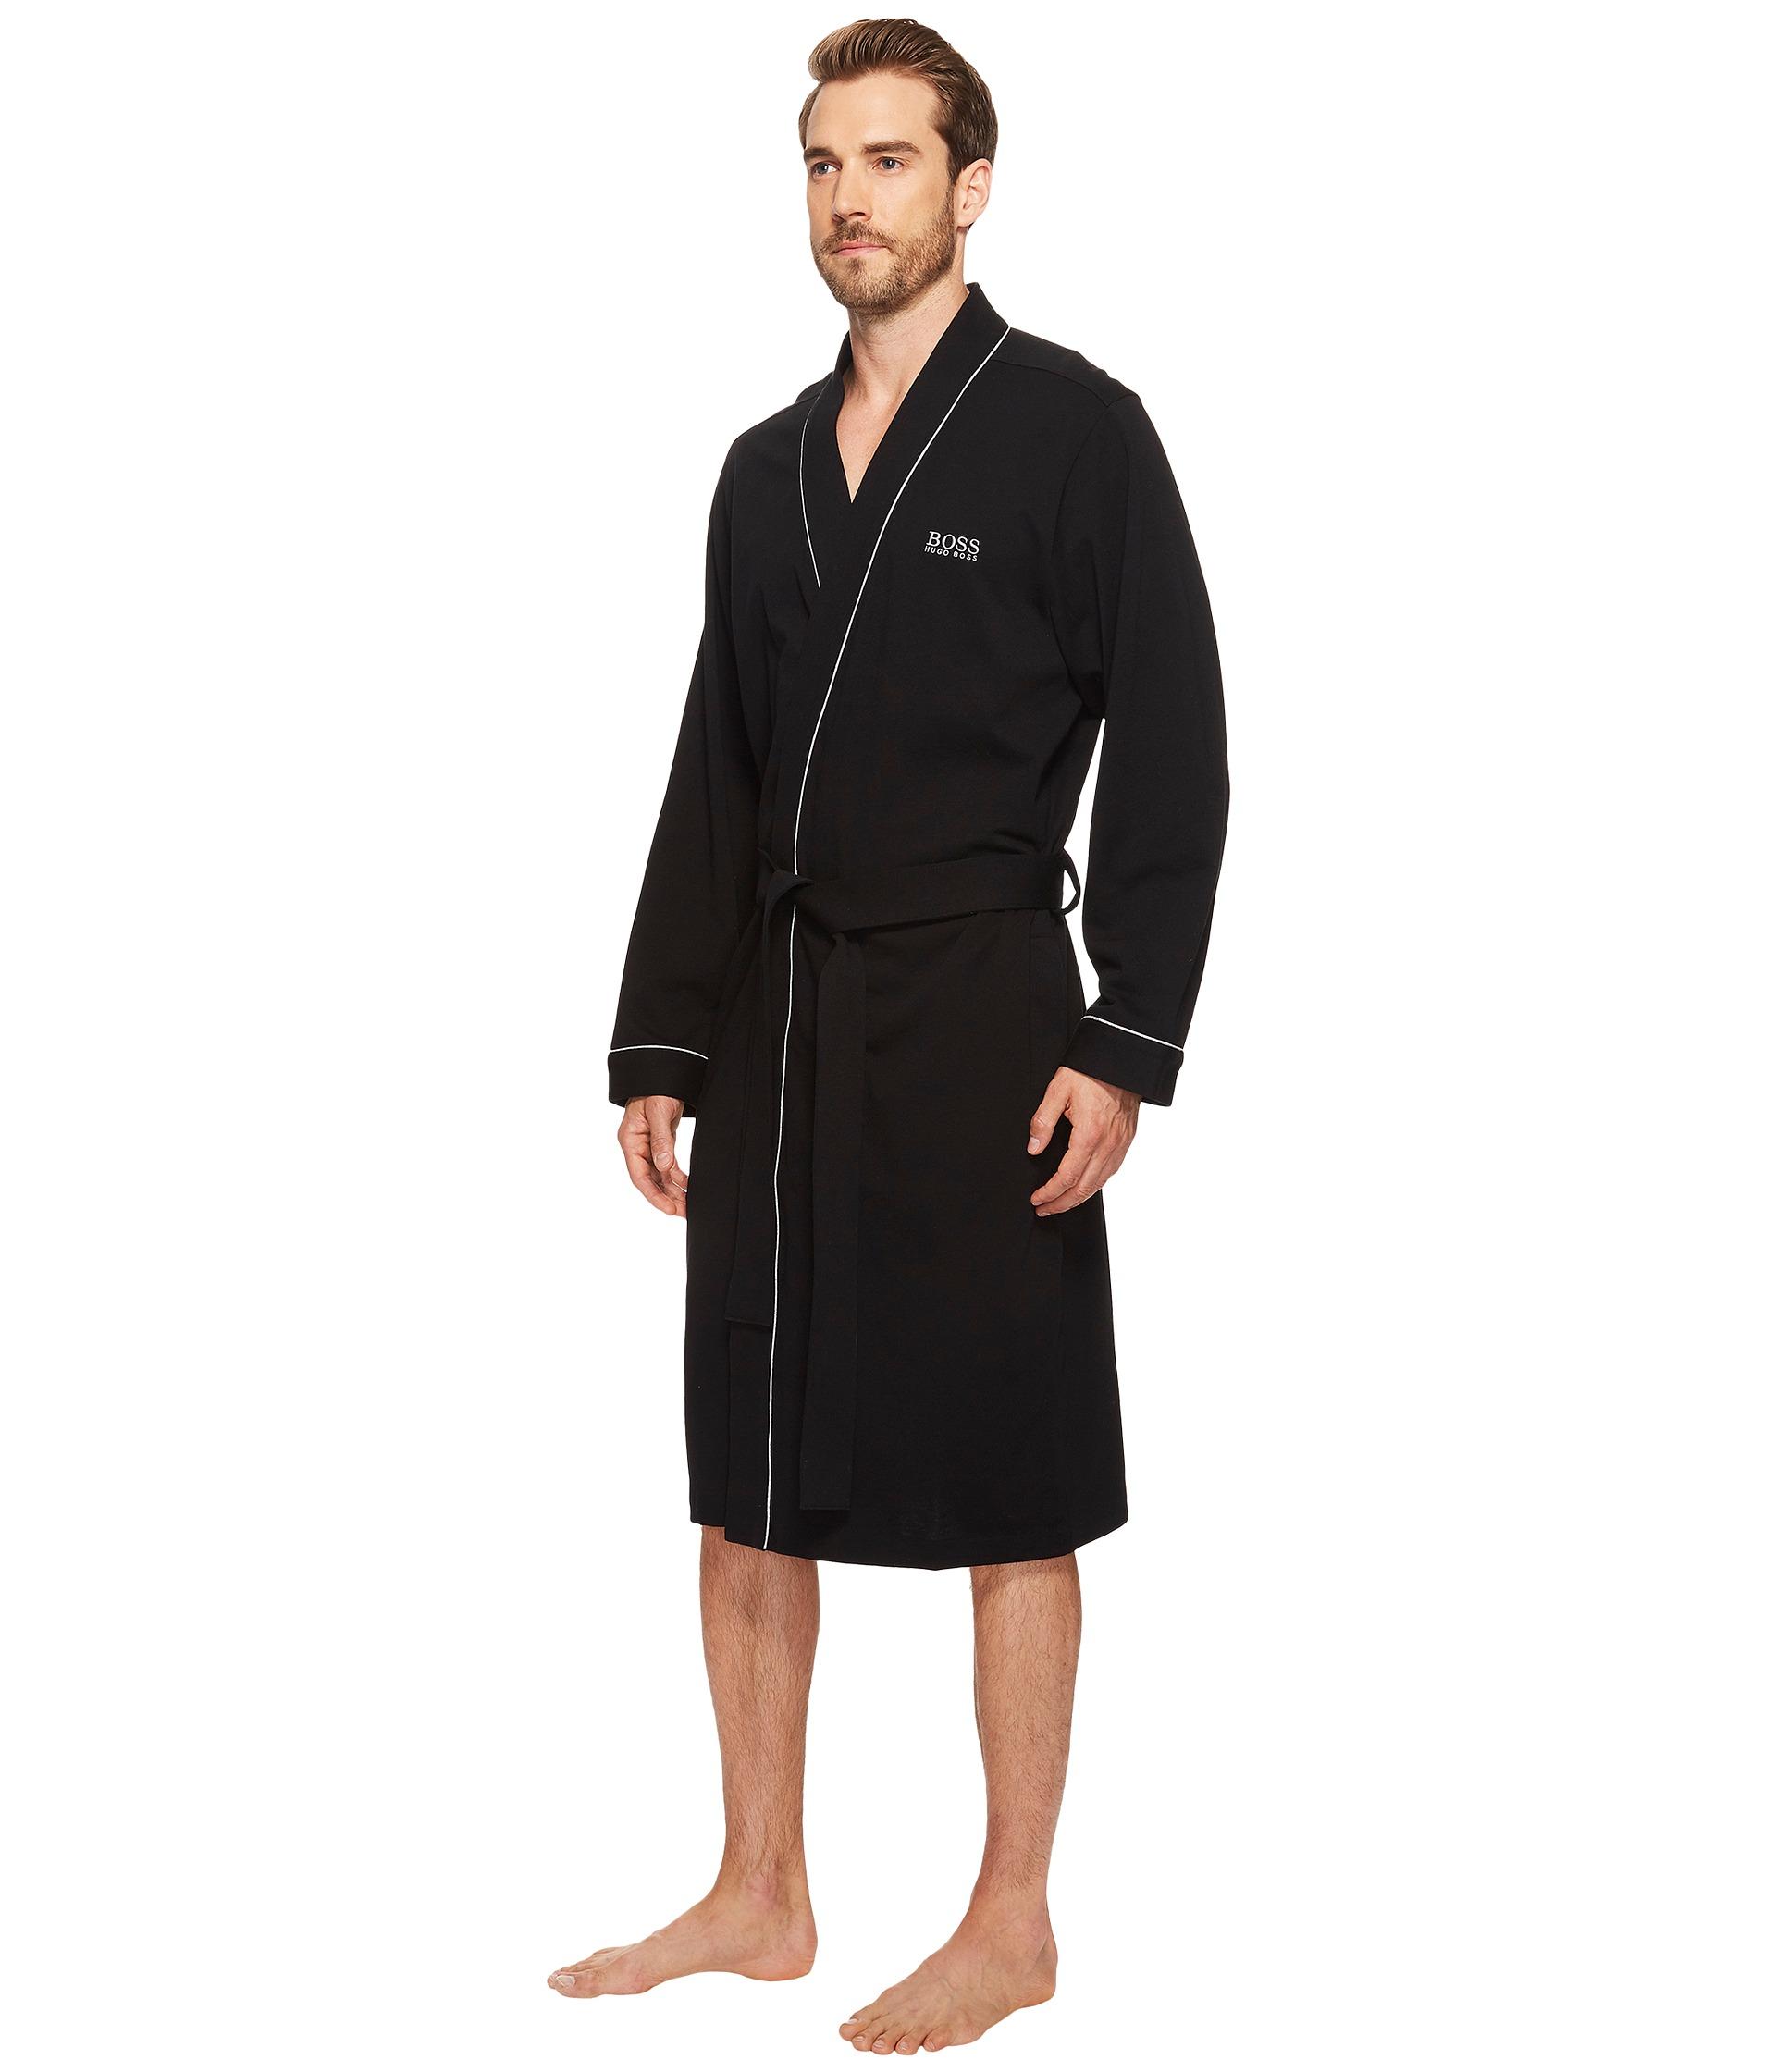 Boss hugo boss innovation 1 cotton kimono robe at for Robe de mariage hugo boss